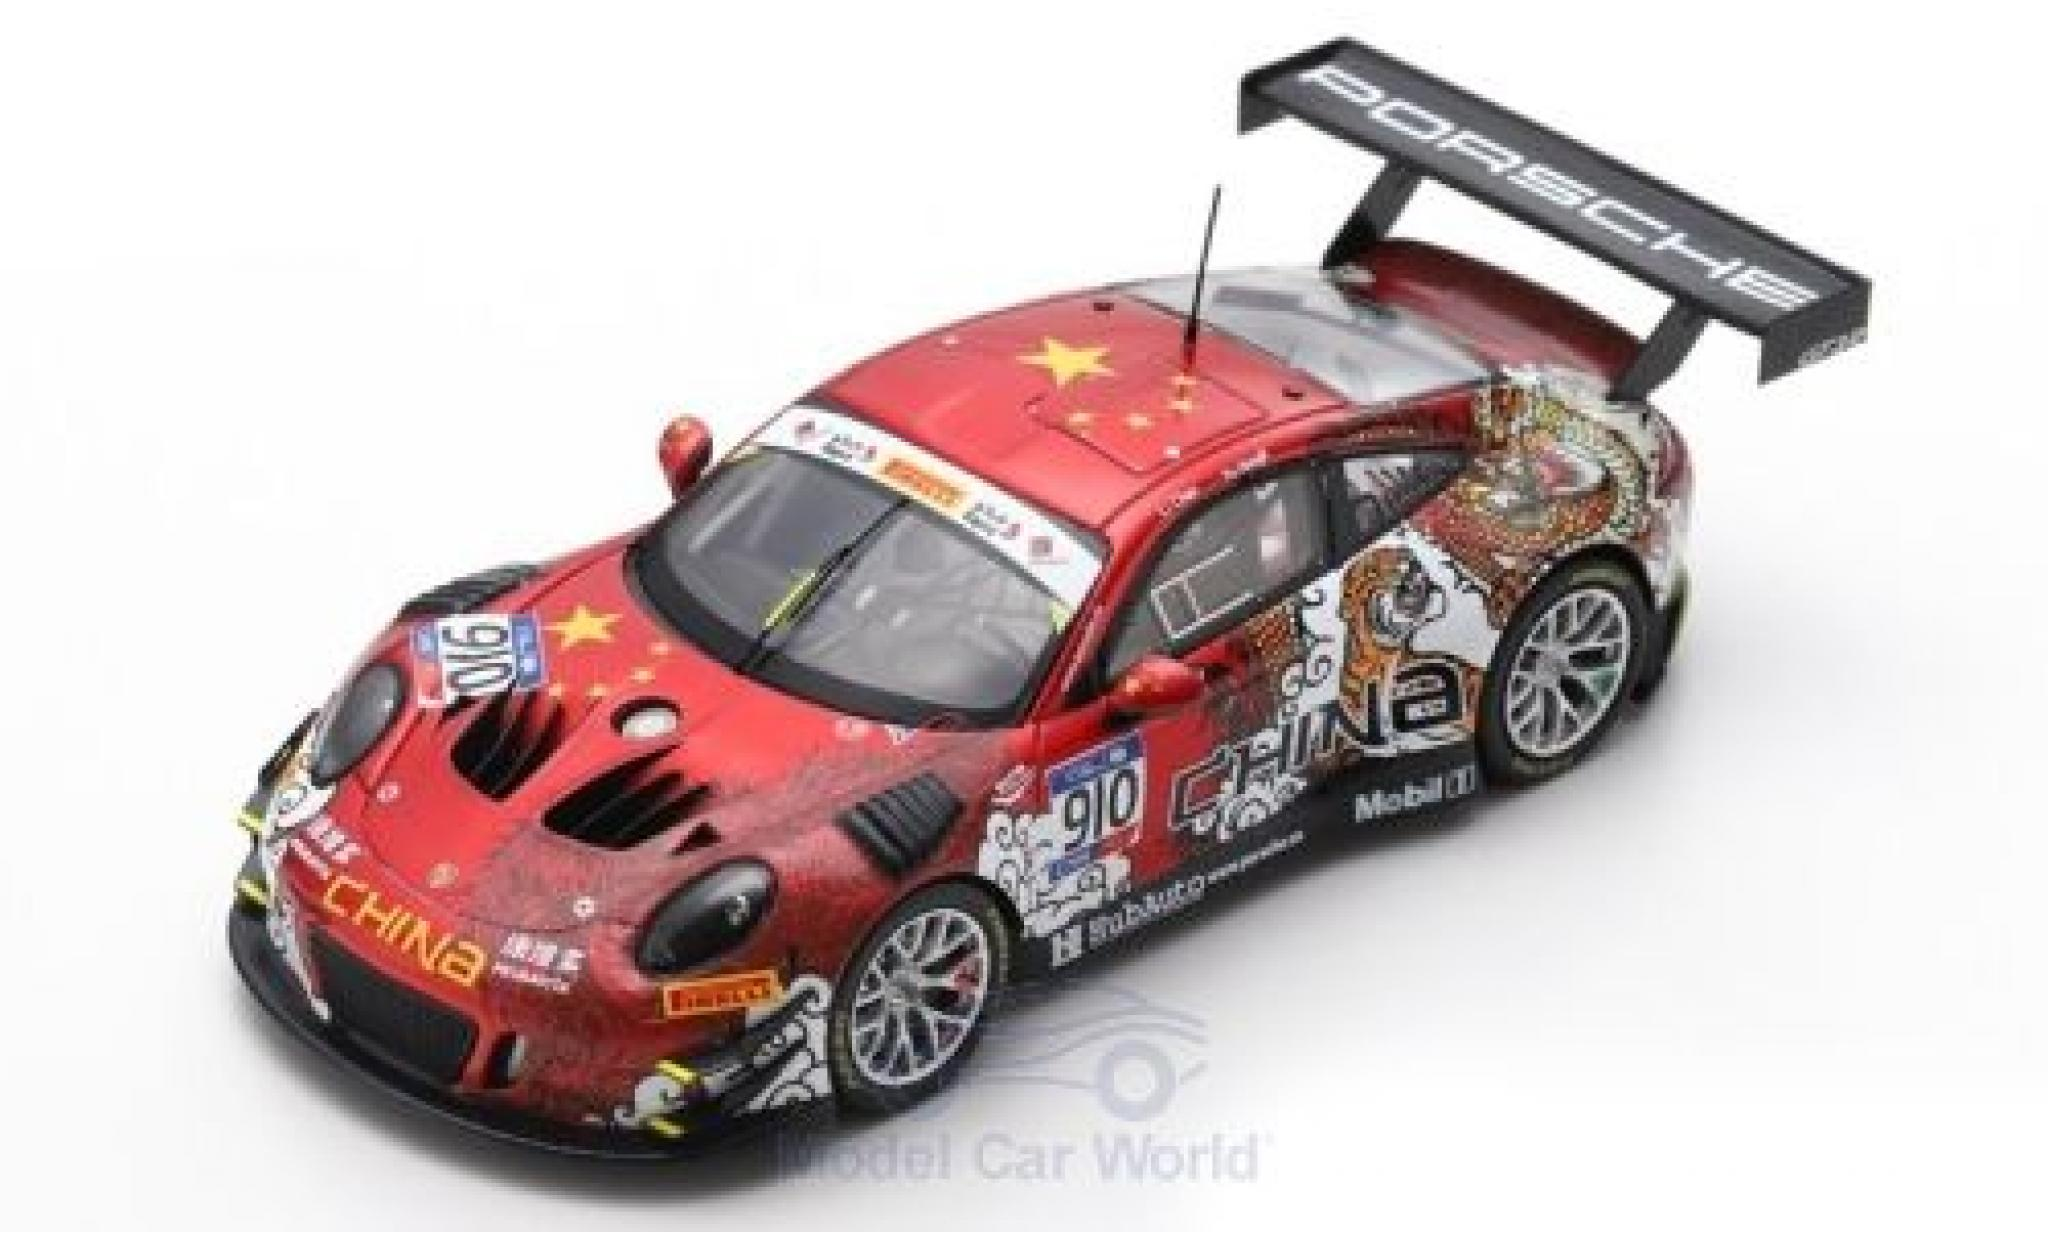 Porsche 991 GT3 R 1/43 Spark 911  No.910 Herberth Motorsport FIA GT Nations Cup Bahrain 2018 Team China L.Chao/Y.Hongli